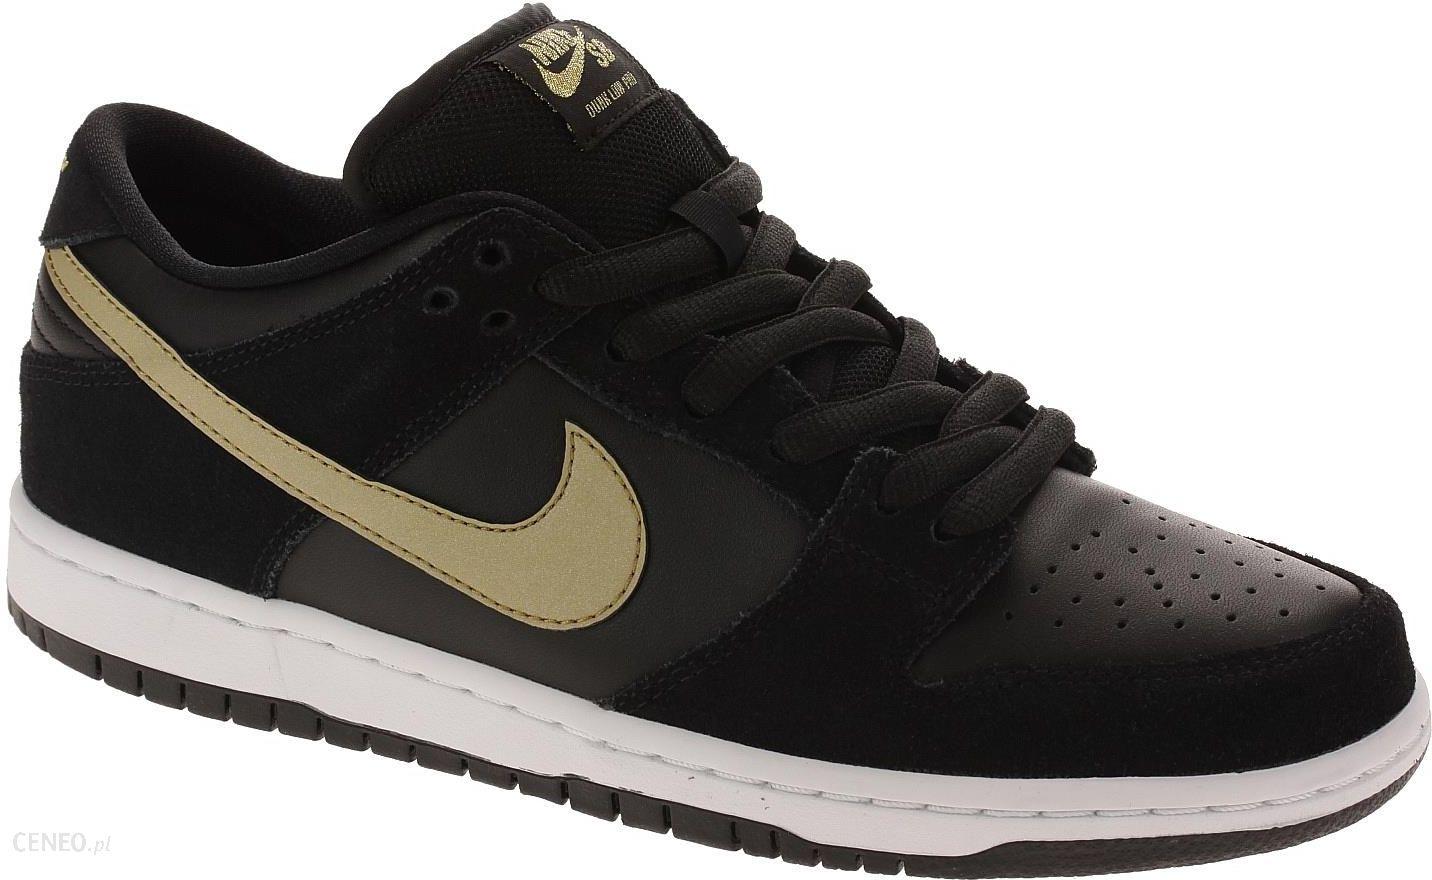 best service 63797 957d3 buty Nike SB Dunk Low Pro - BlackMetallic GoldWhite 42 - zdjęcie